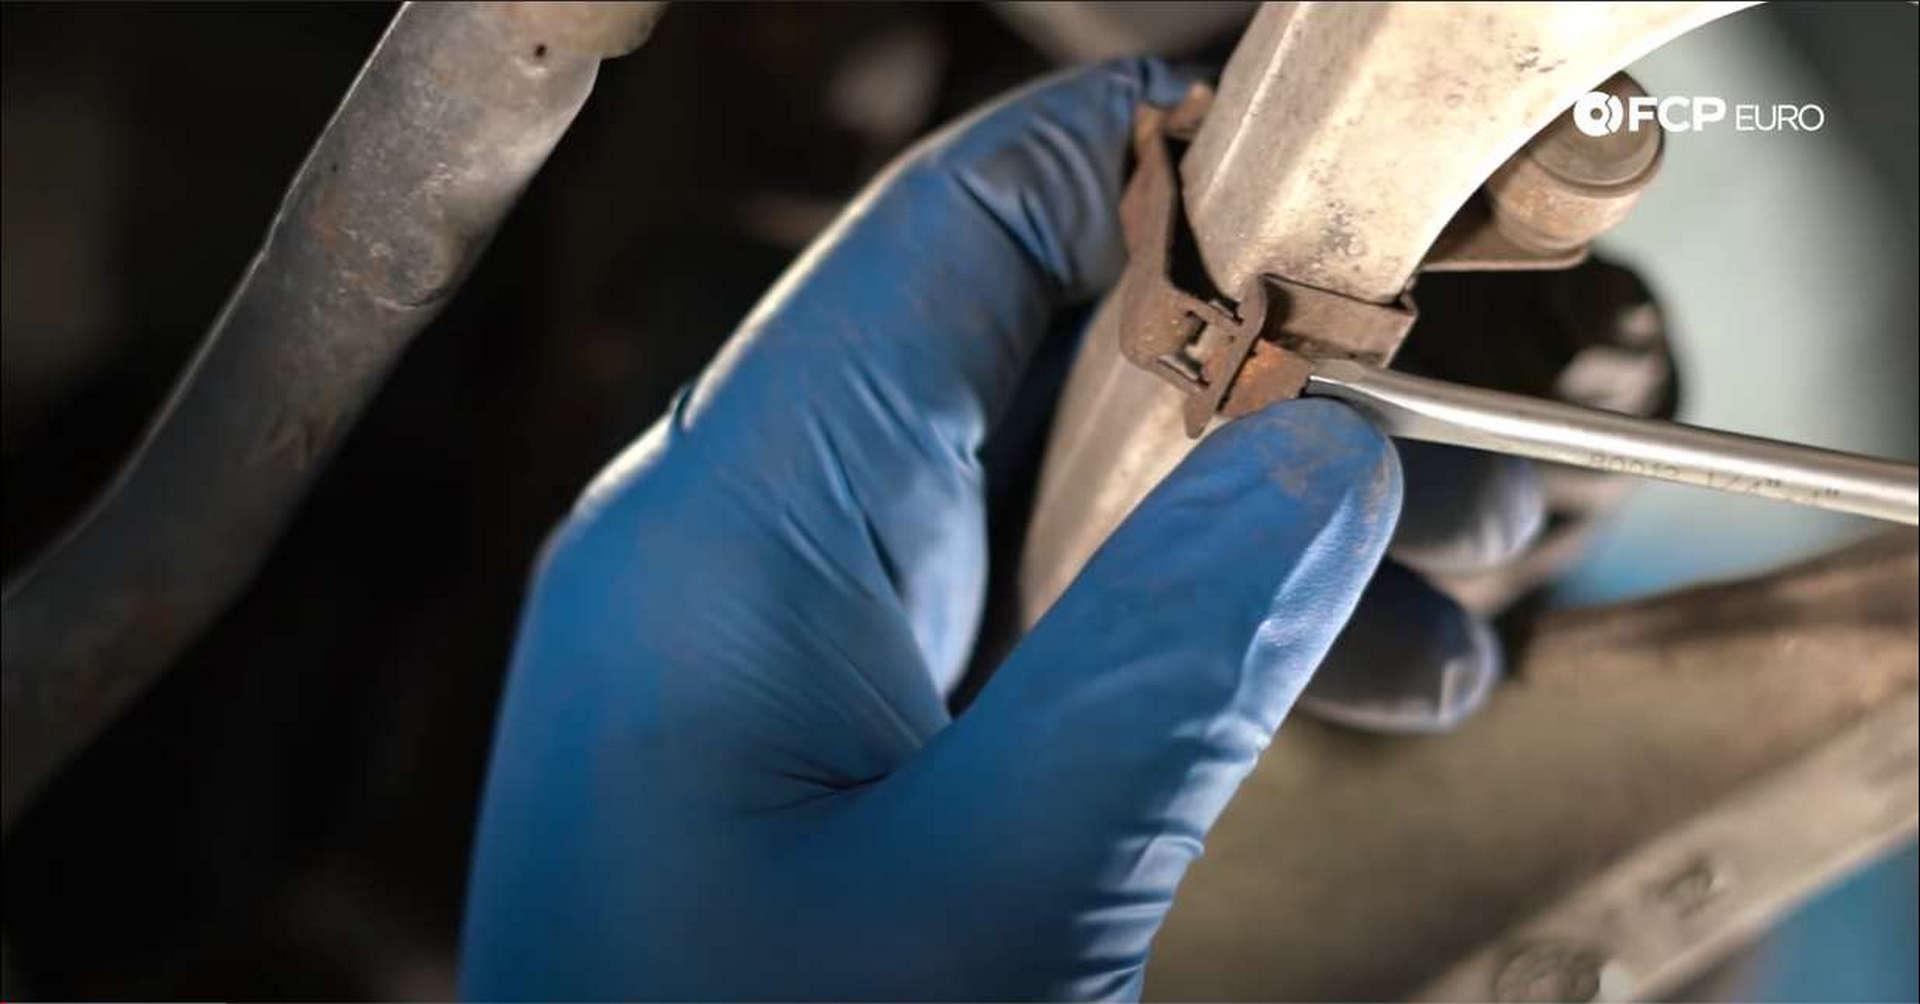 DIY BMW Front Suspension Refresh removing headlight sensor